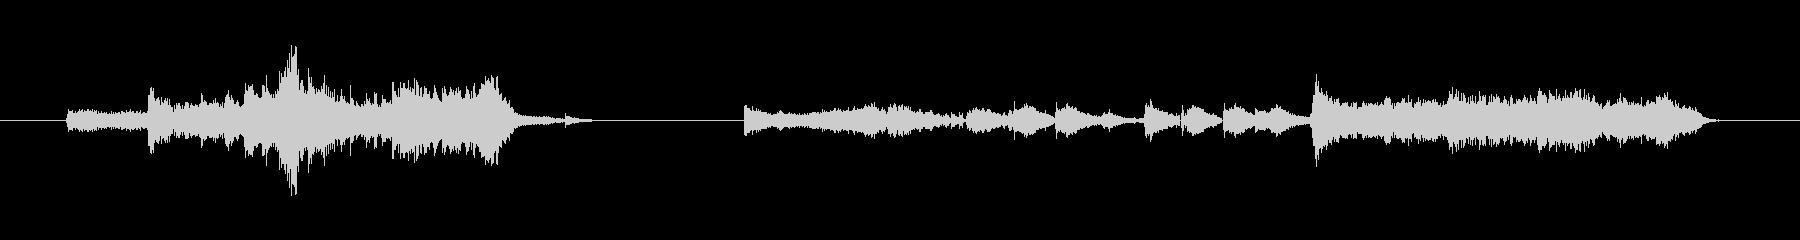 Sci-fi orchestra sound is impressive's unreproduced waveform